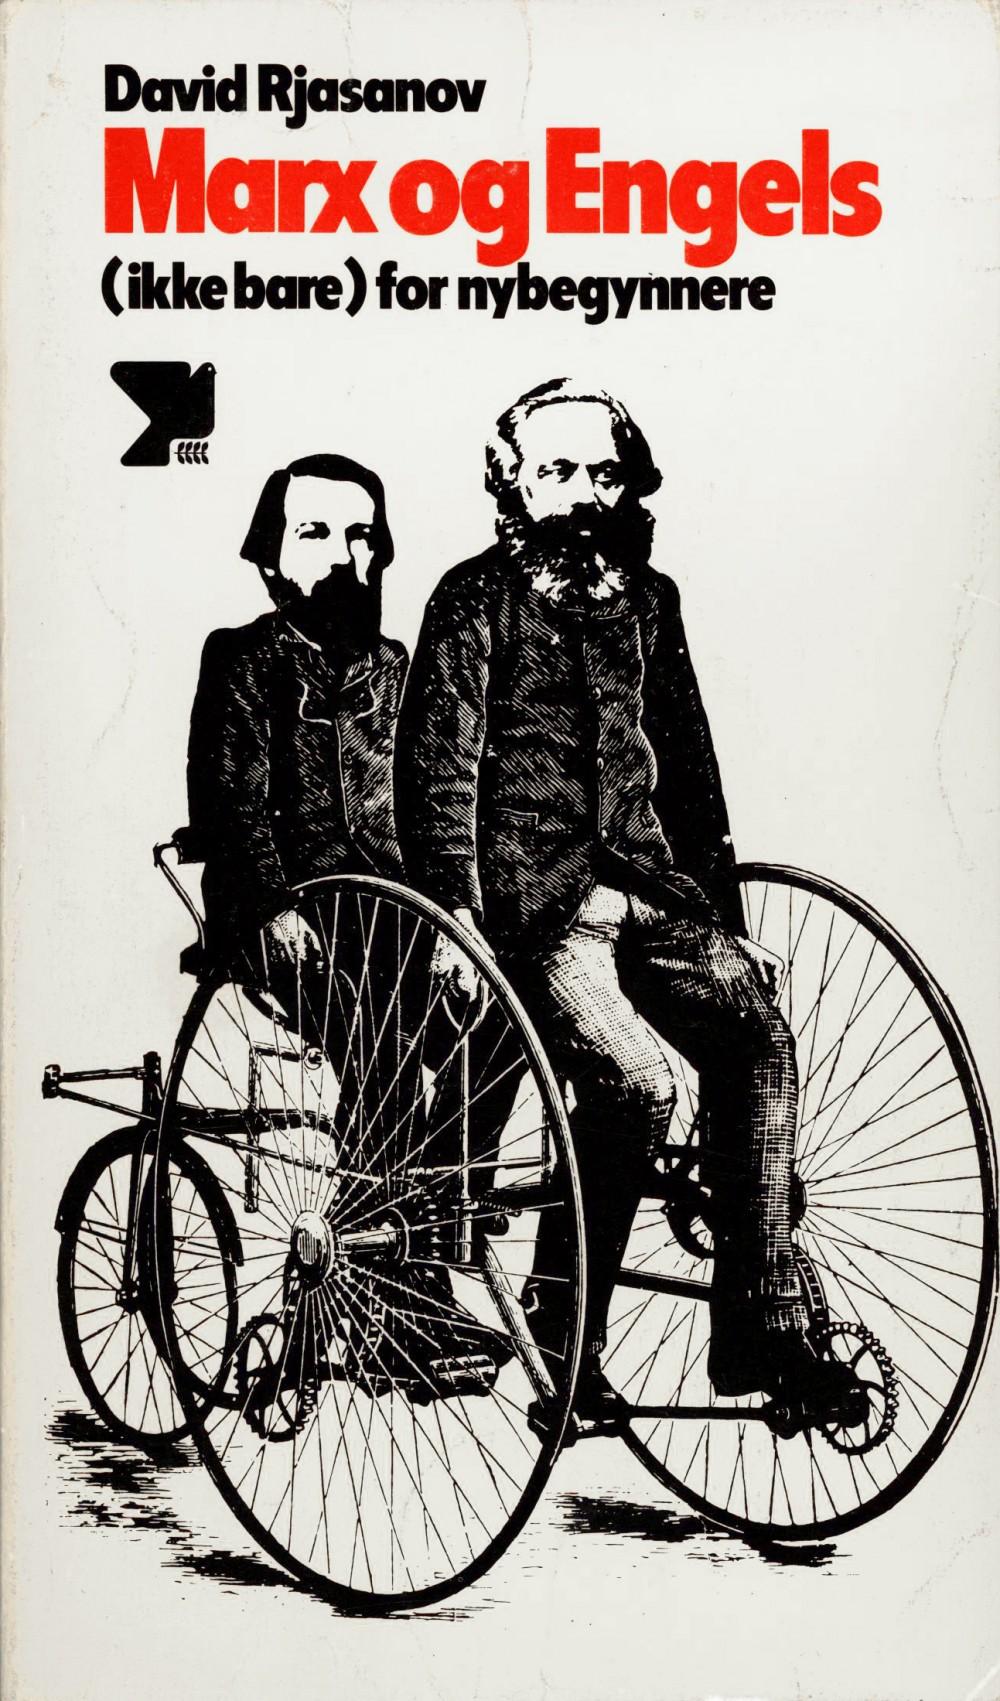 David Rjasanov: Marx og Engels (ikke bare) for nybegynnere